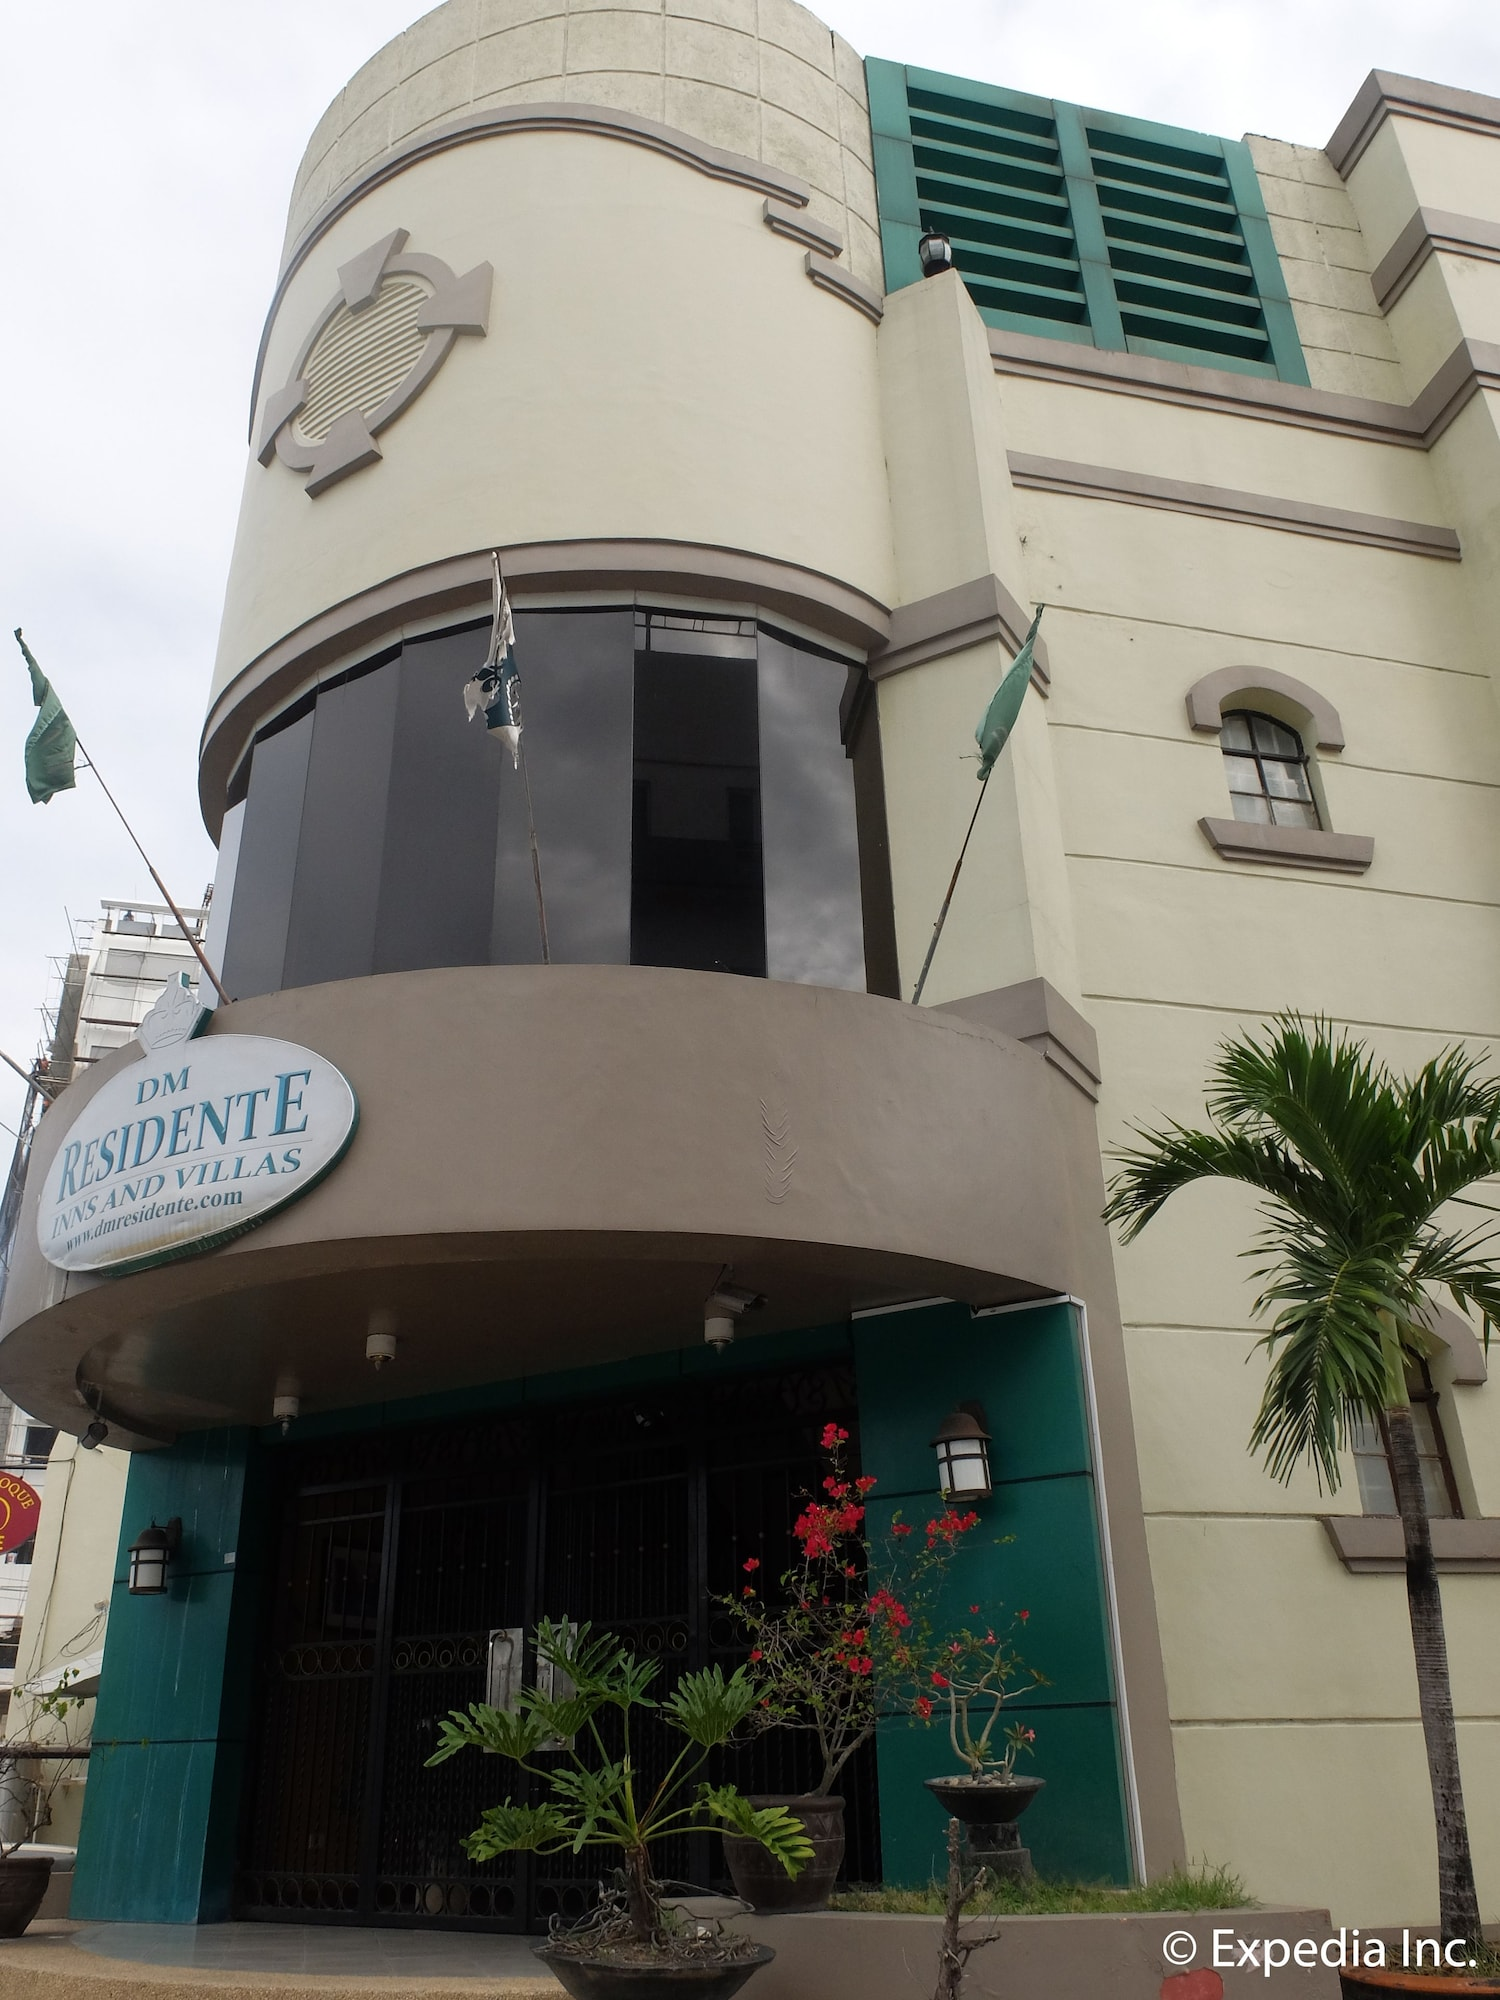 DM Residente Hotel, Mabalacat